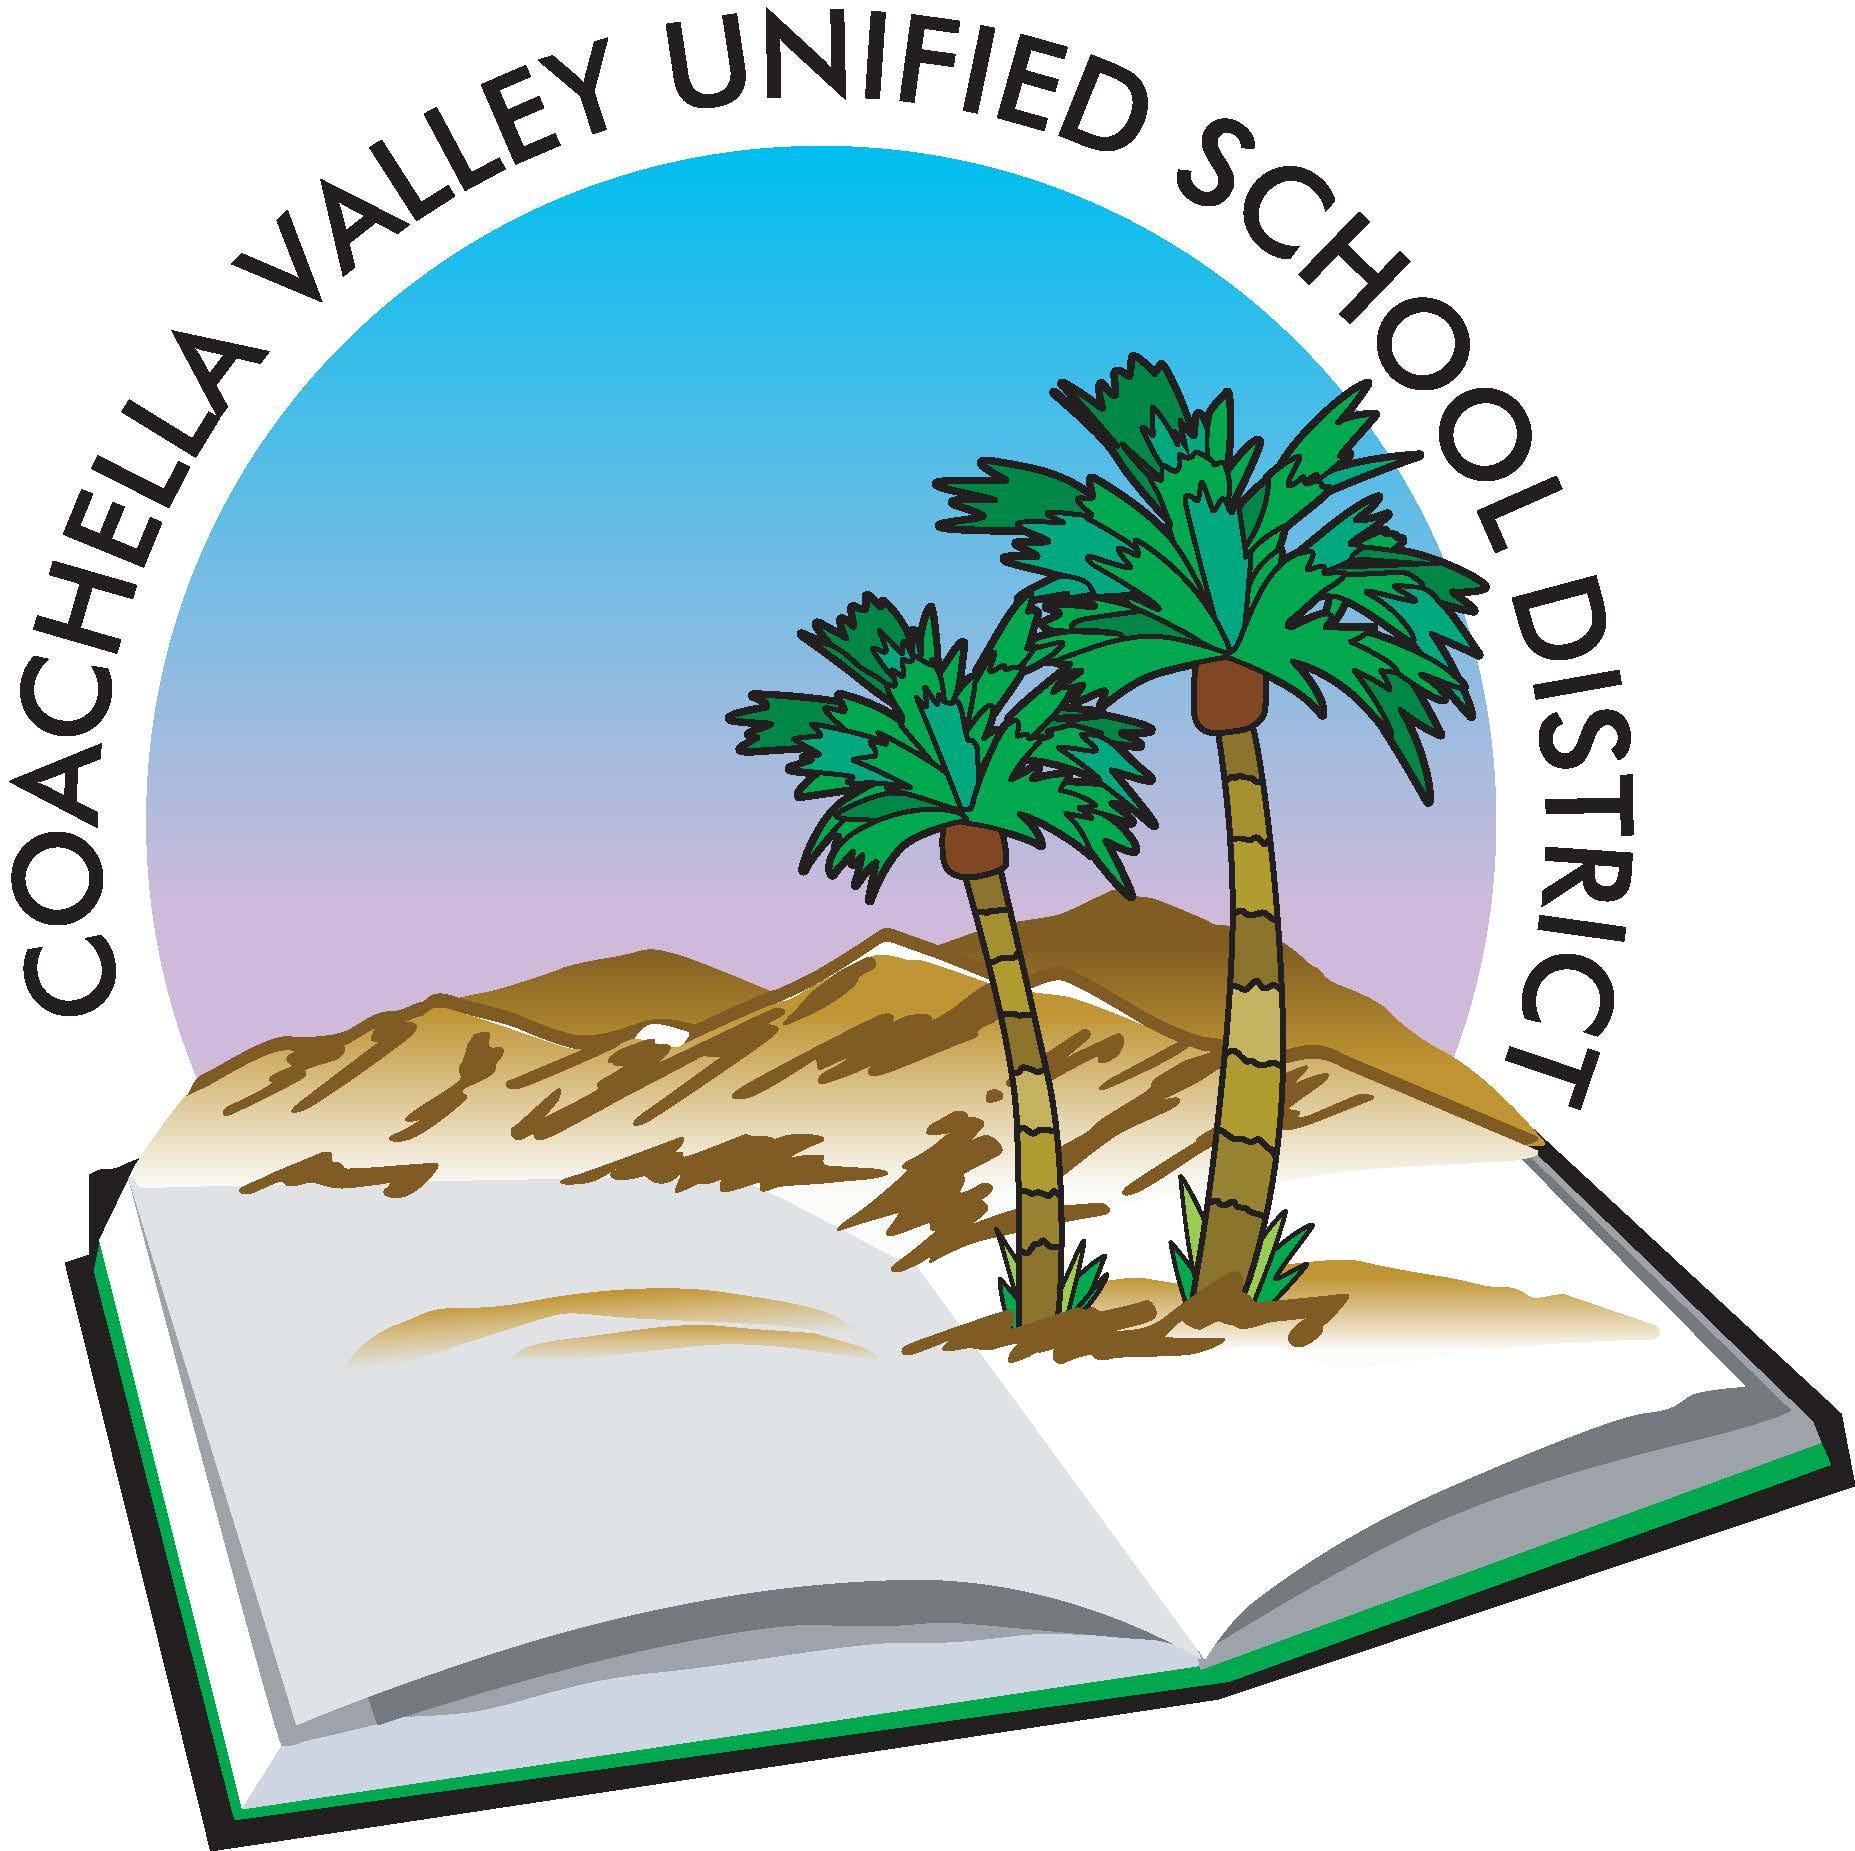 coachella logo for website.jpg